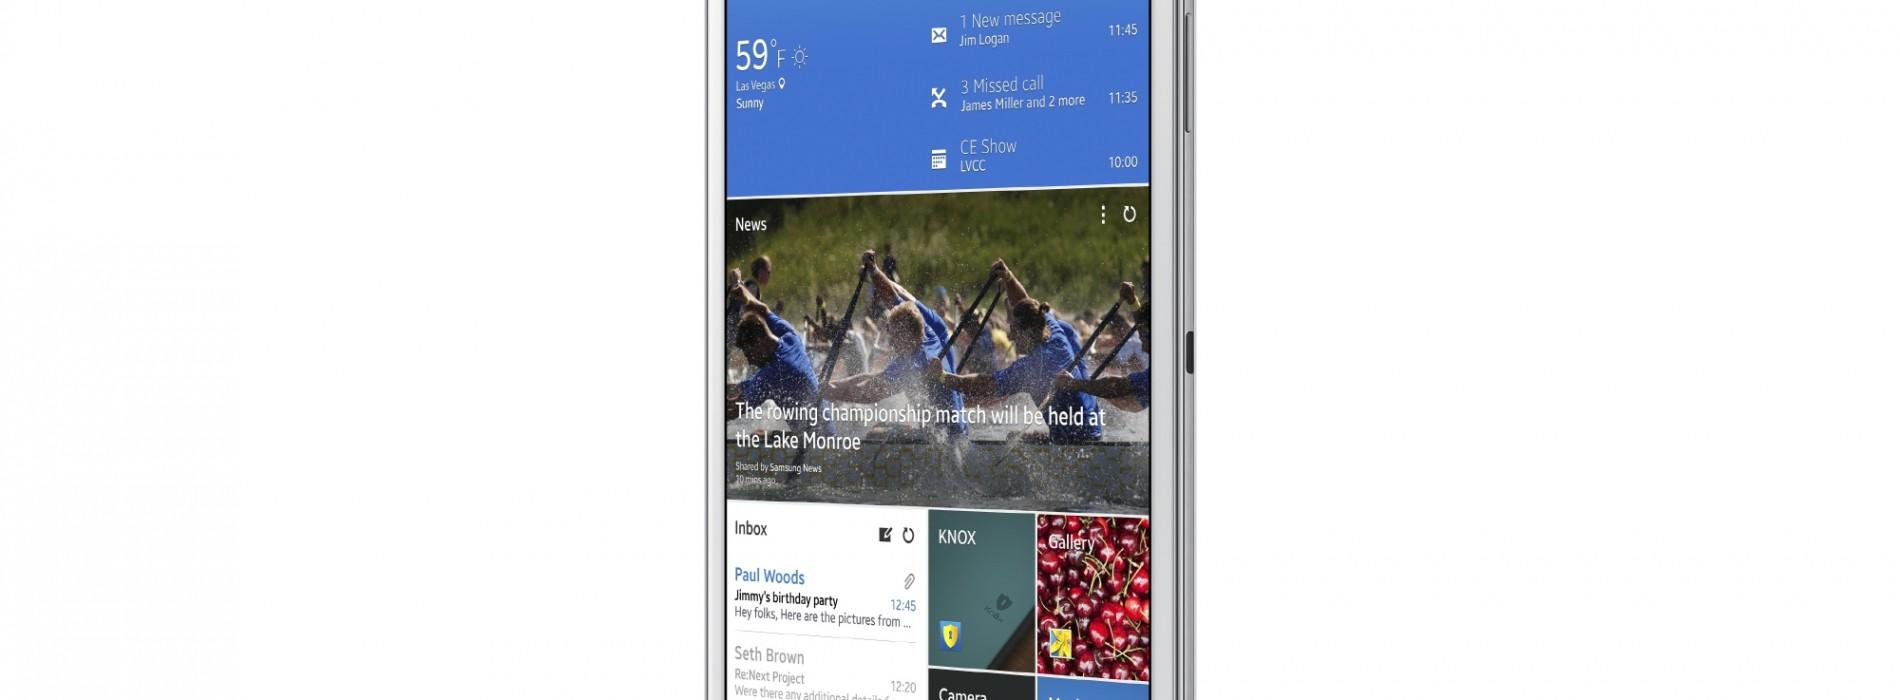 Gallery: Samsung Galaxy TabPRO 8.4